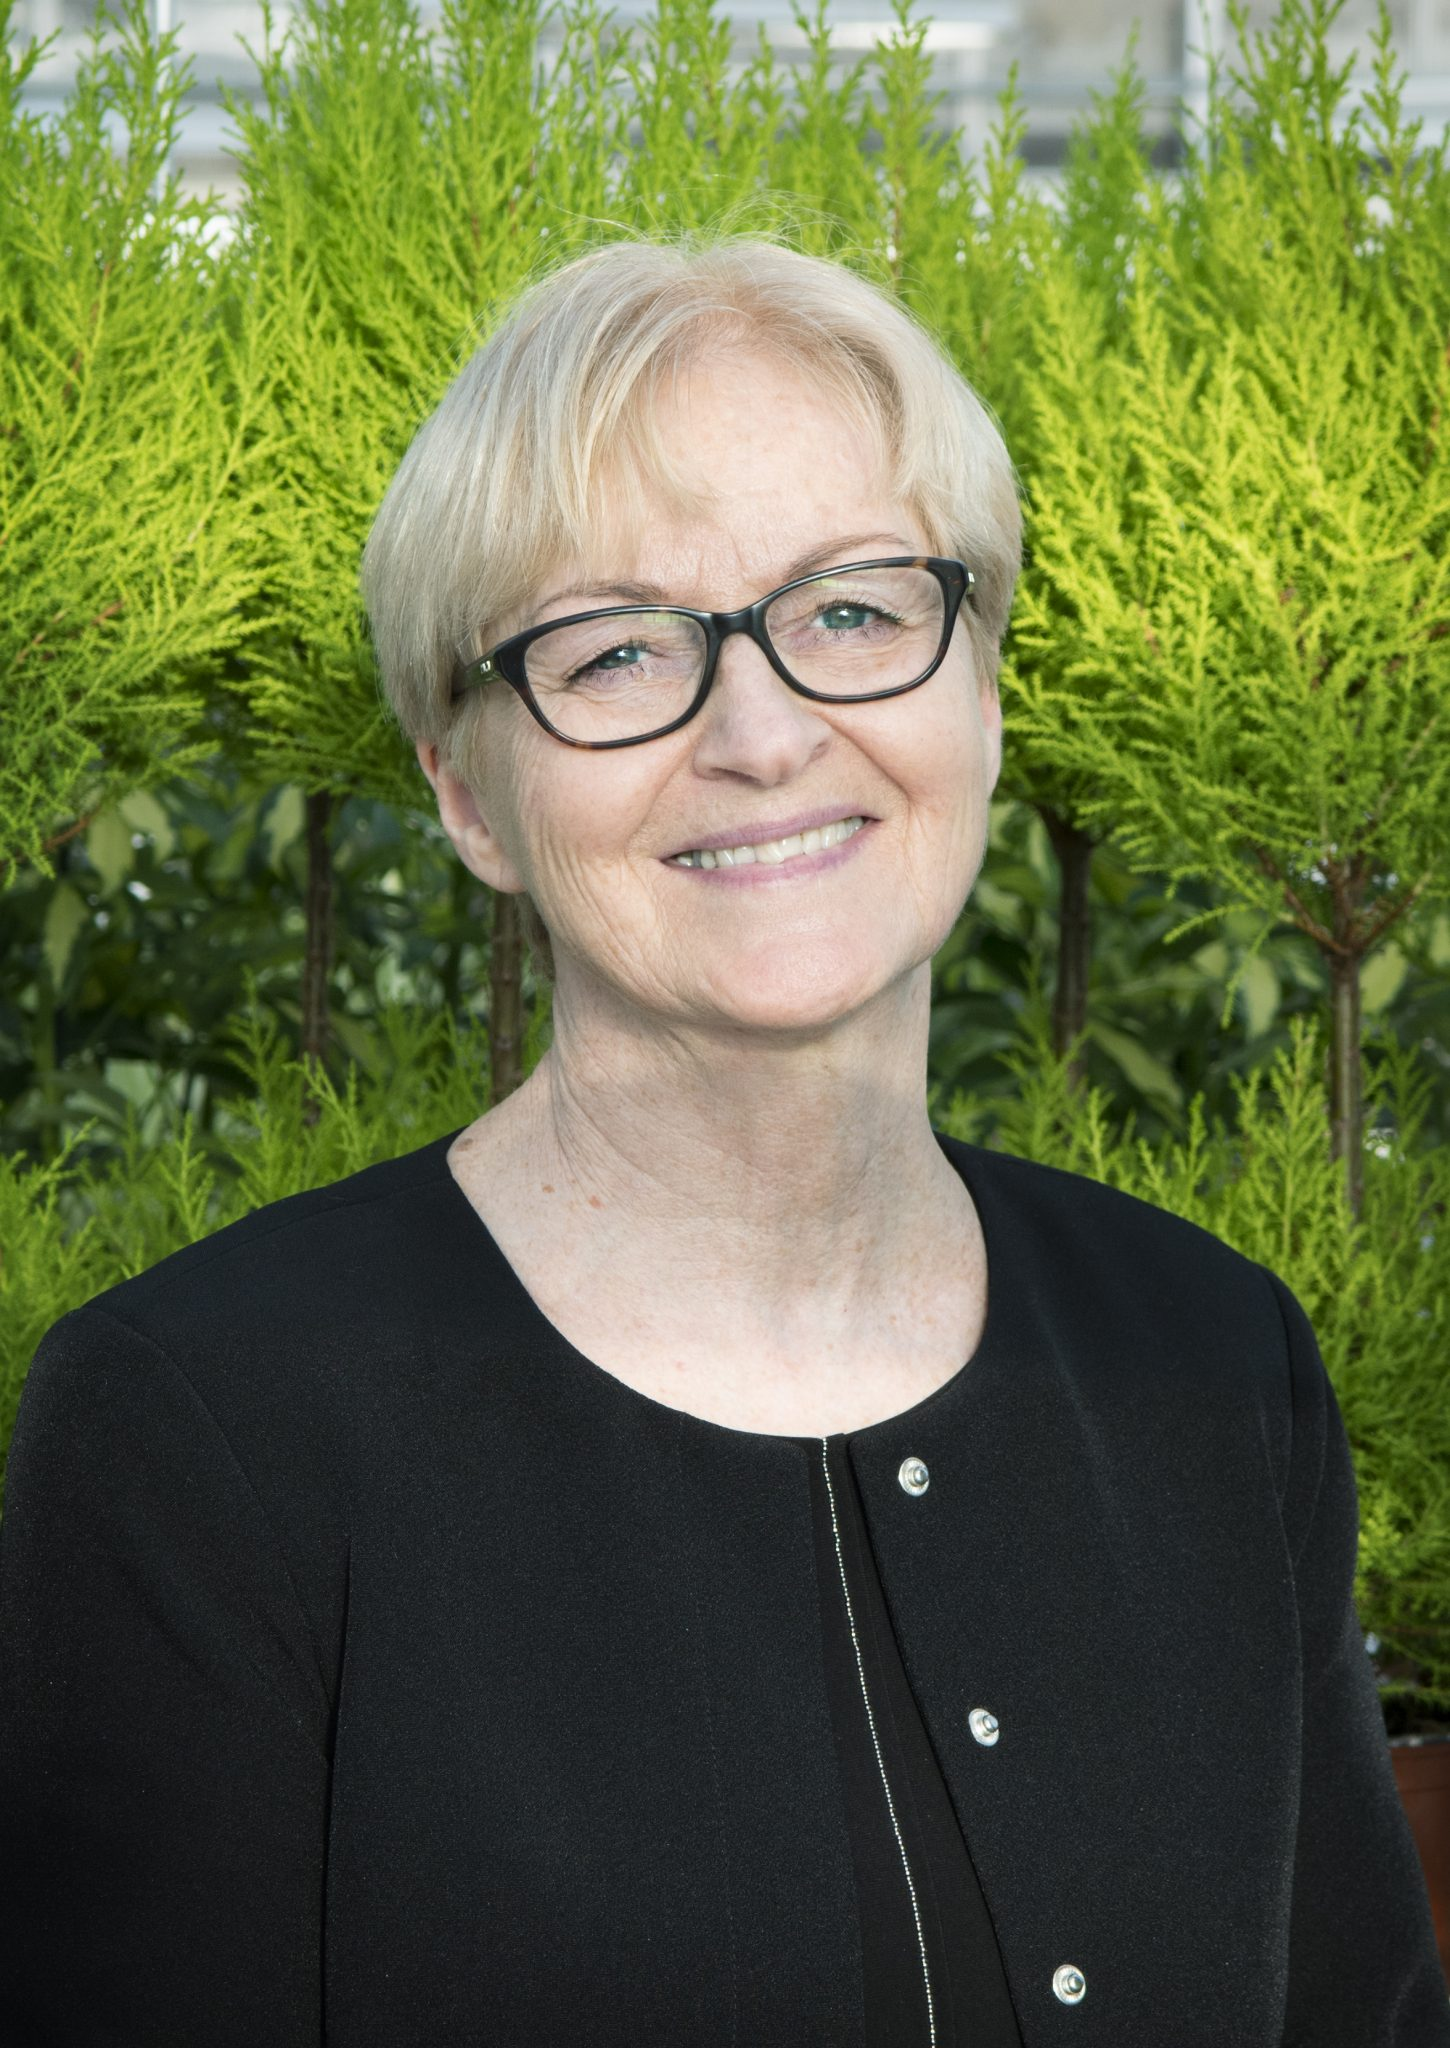 Birgitta Groth